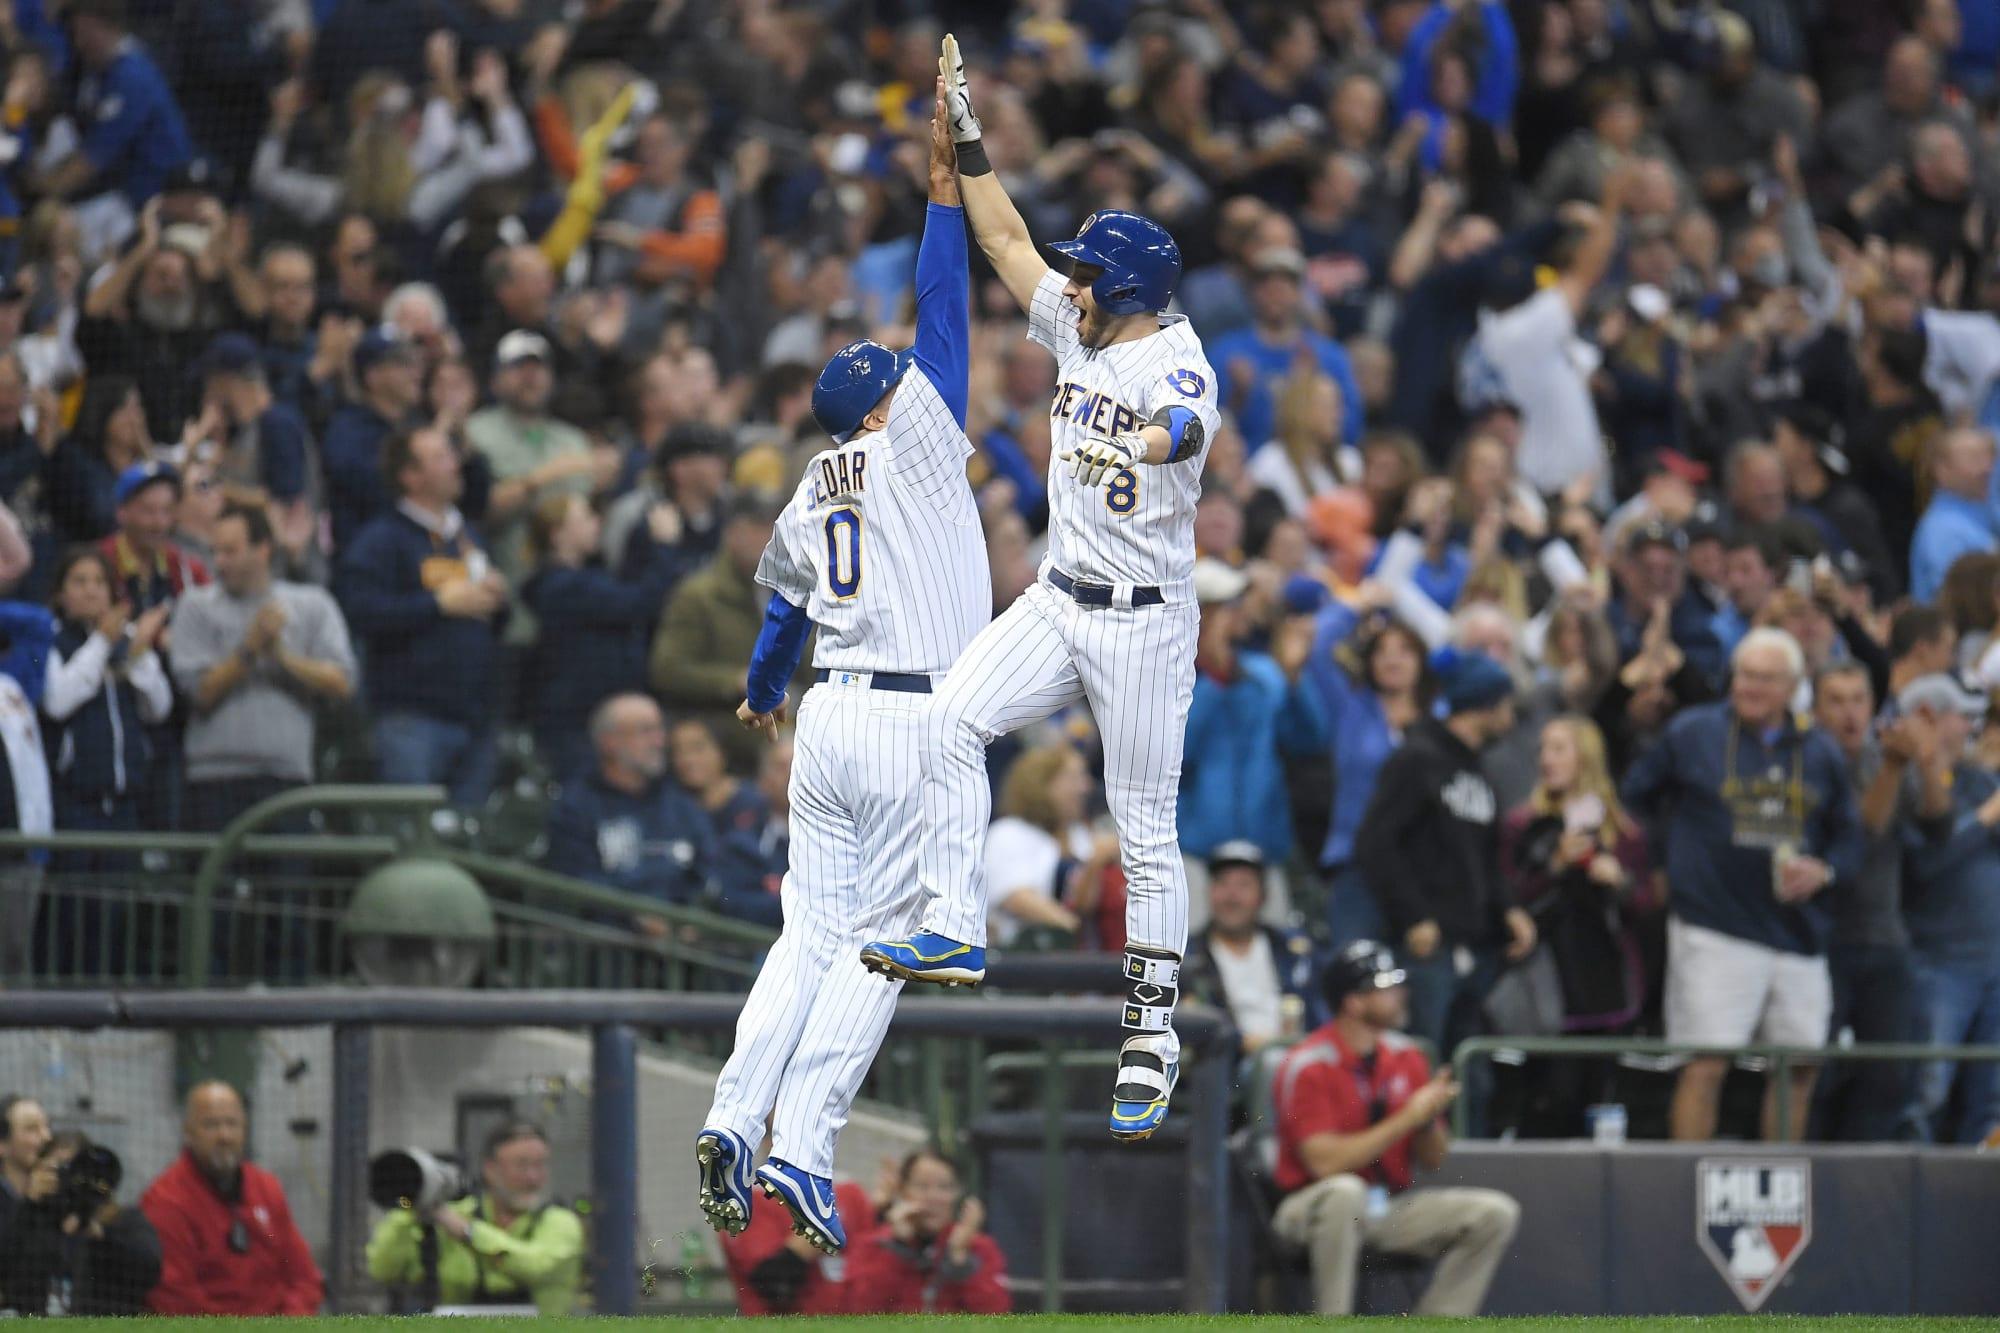 Milwaukee Brewers: Universal DH is Good News for Ryan Braun